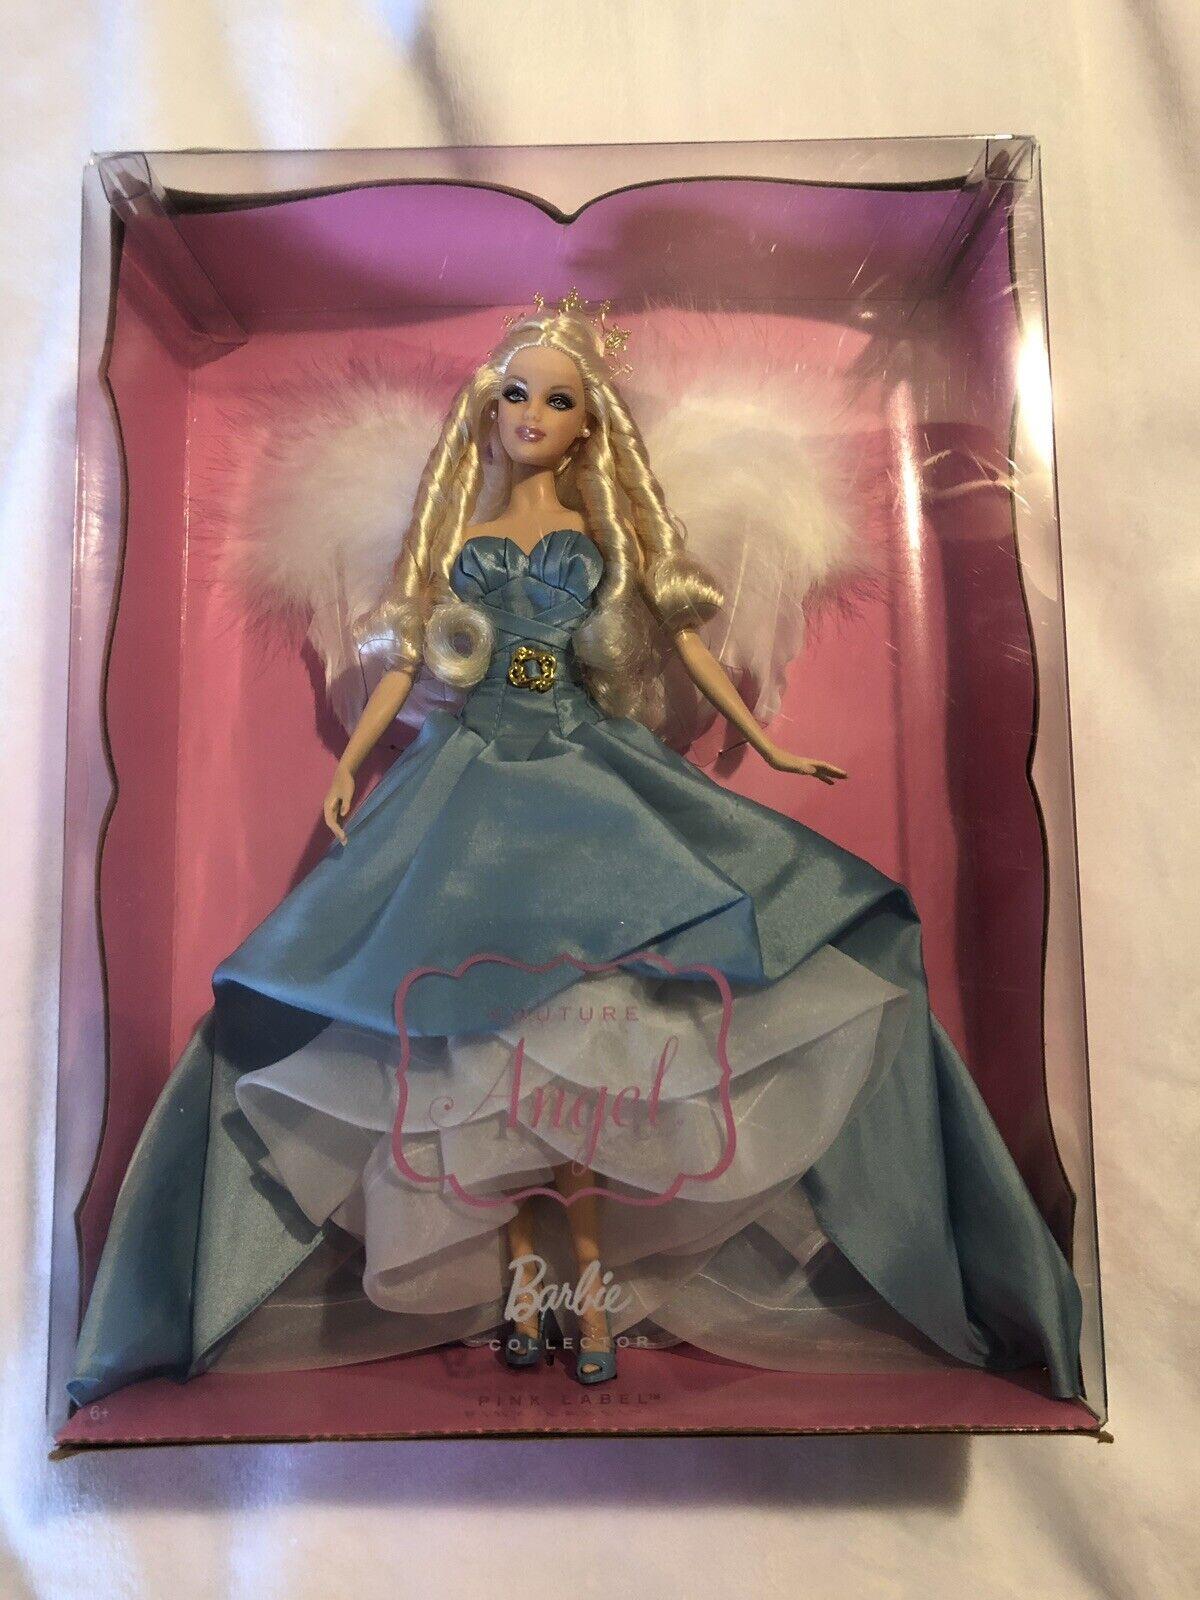 NIB Barbie 2010 Couture Angel Doll